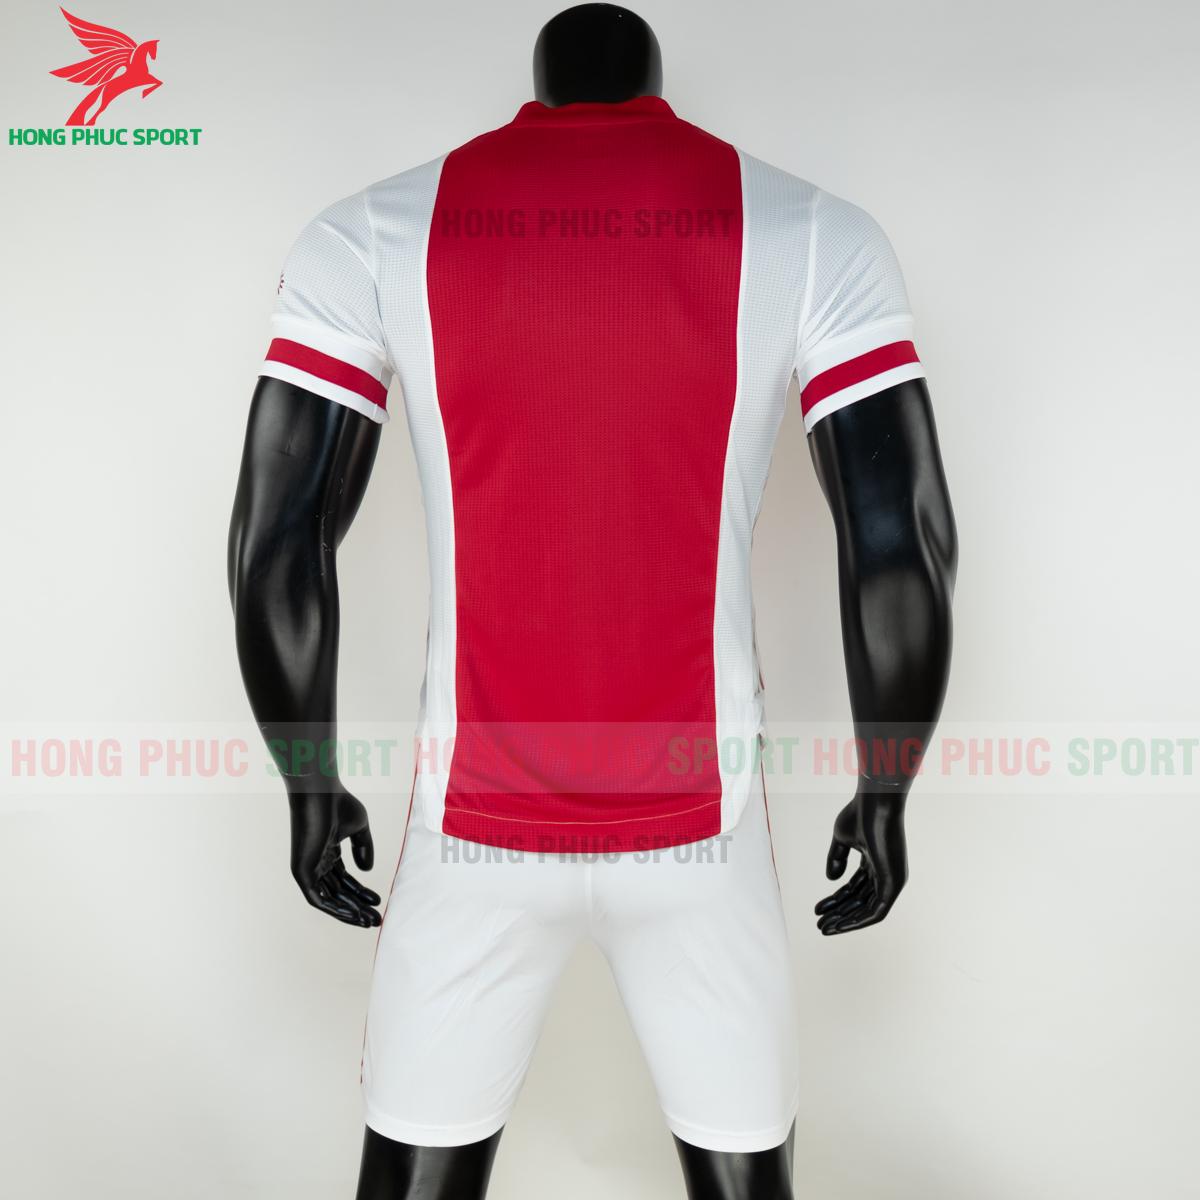 https://cdn.hongphucsport.com/unsafe/s4.shopbay.vn/files/285/ao-bong-da-ajax-amsterdam-2020-2021-san-nha-hang-thailand-8-5f8feeb14159e.png